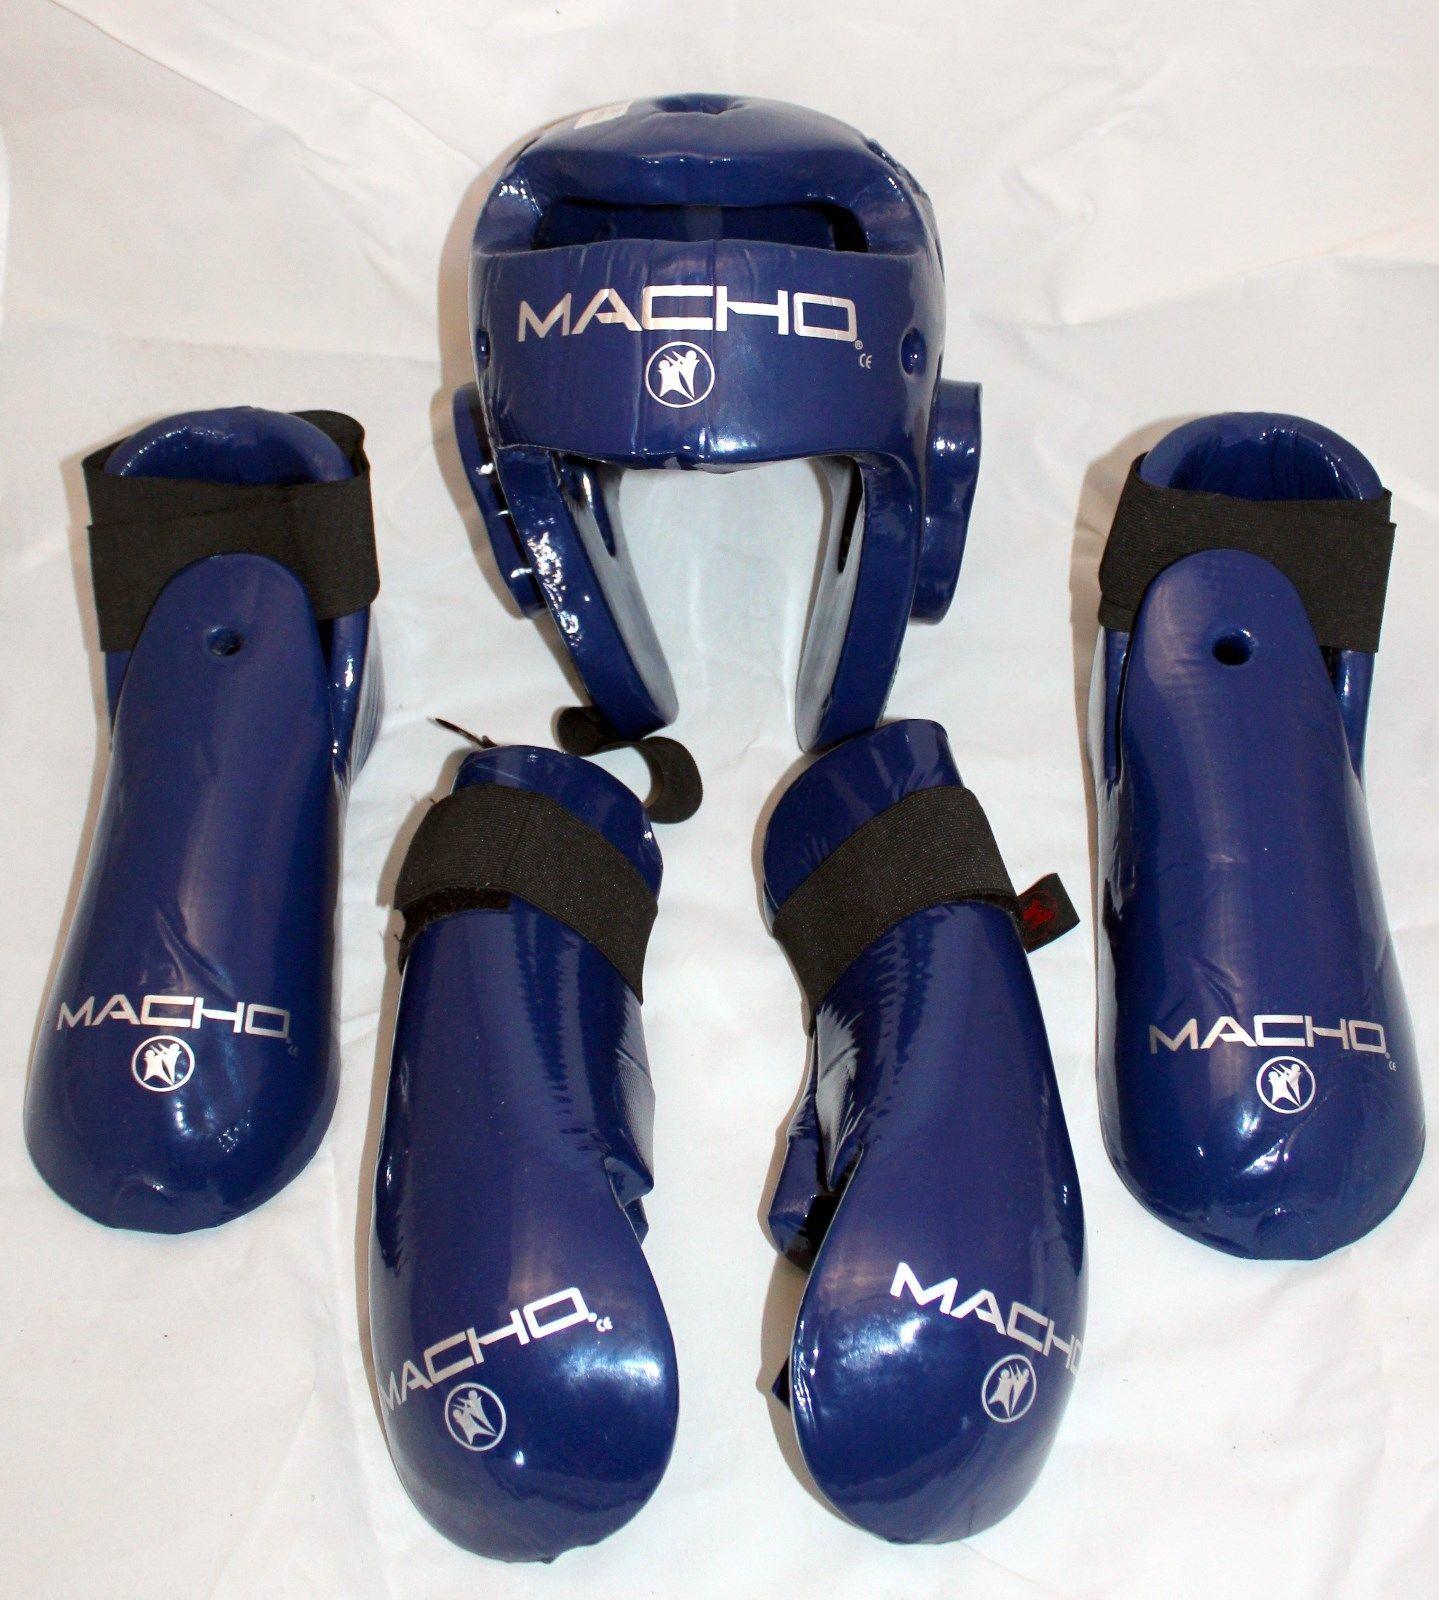 Macho DYNA Blue Sparring Gear  karate sparring DYNA BLUE 5 piece set